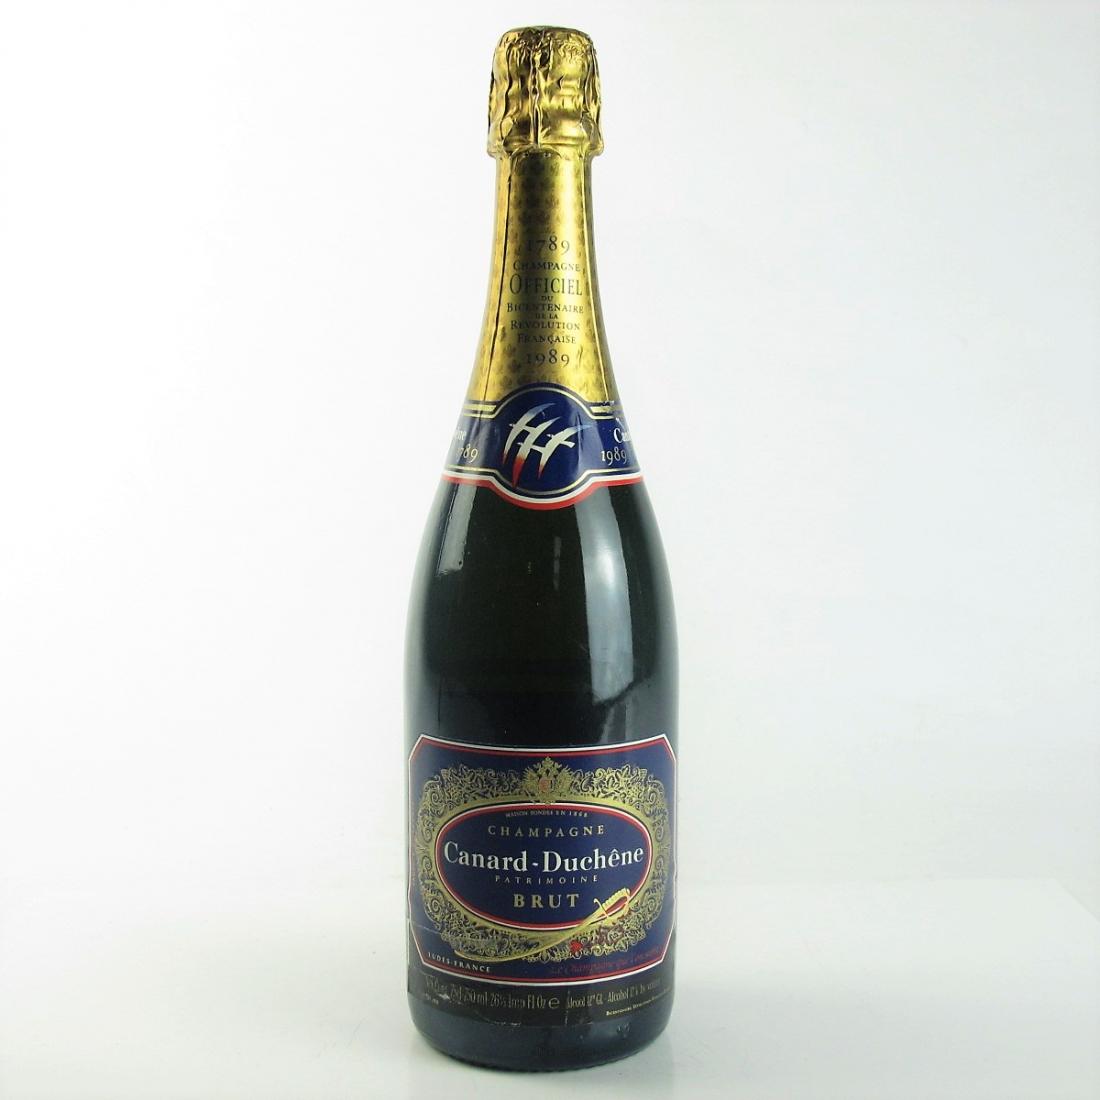 Canard-Duchene Brut NV Champagne